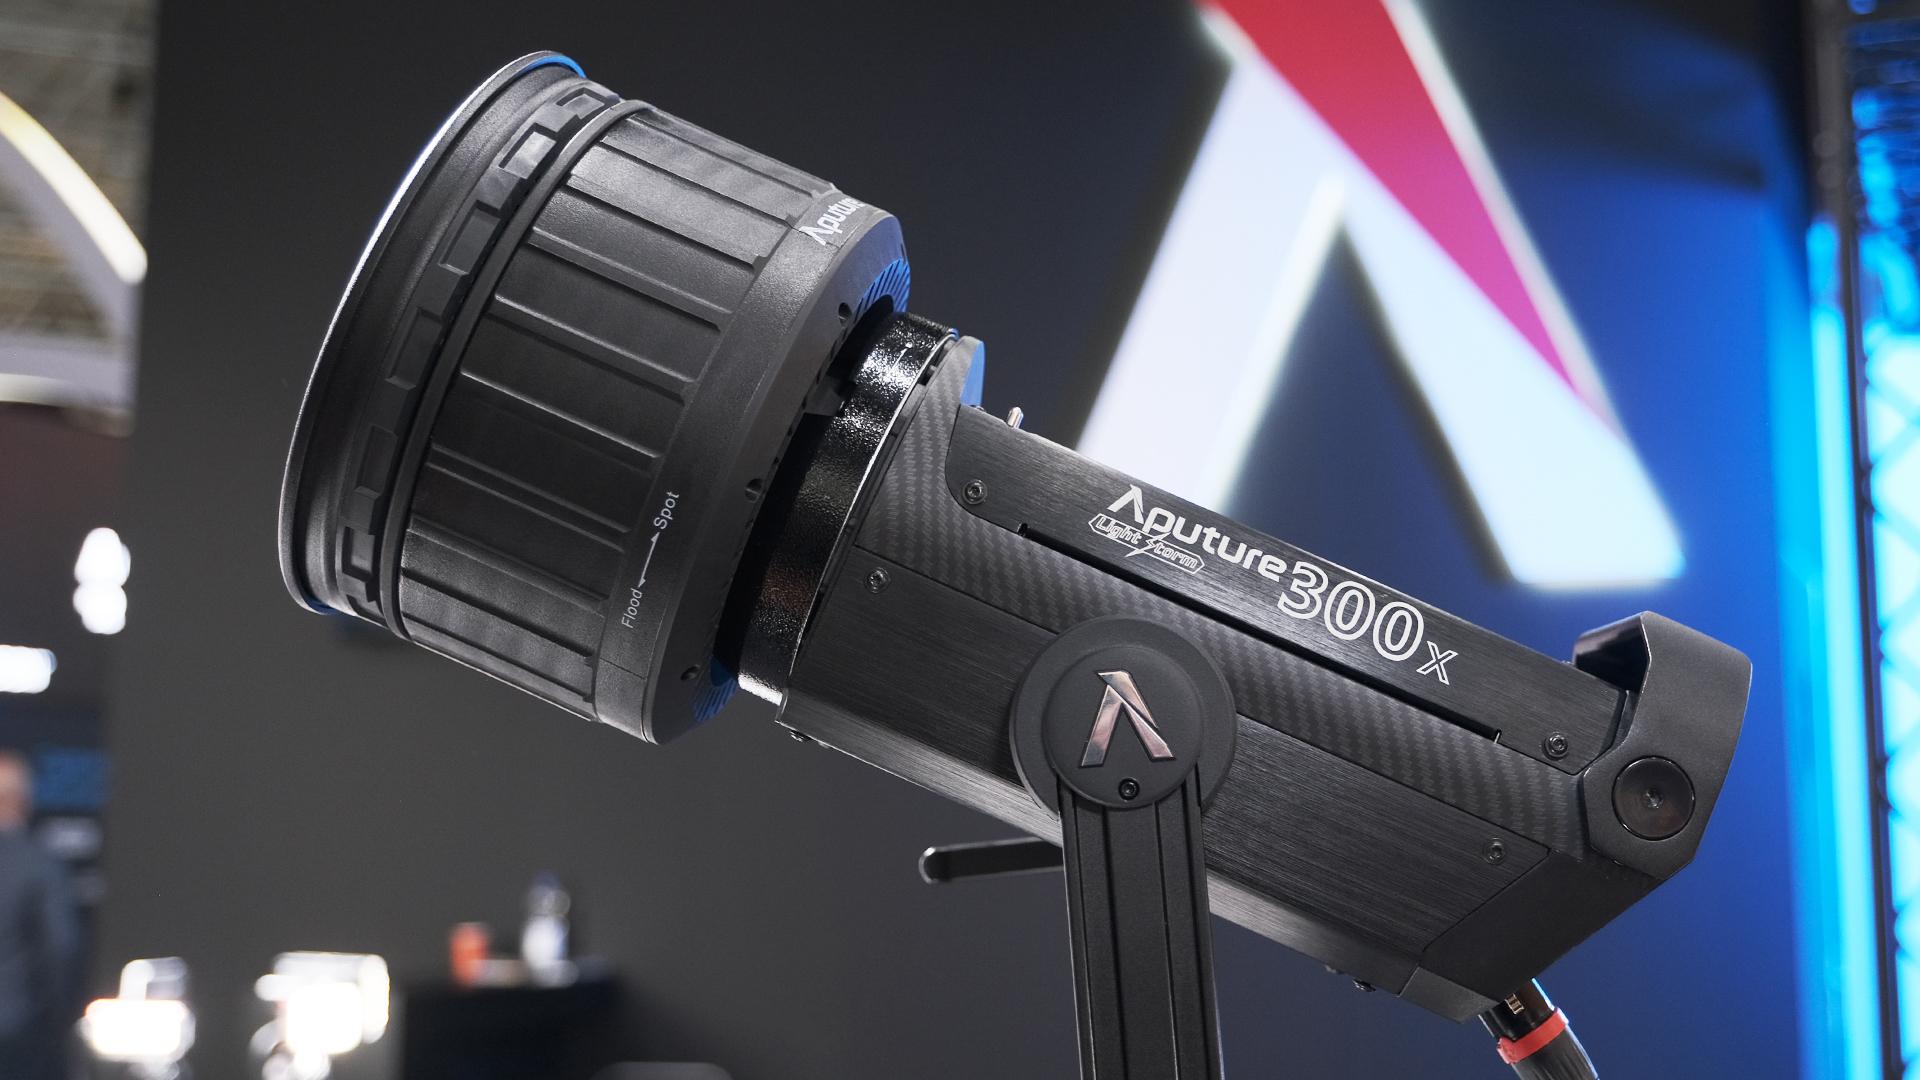 Aputure LS 300x - Luz LED bicolor COB simple